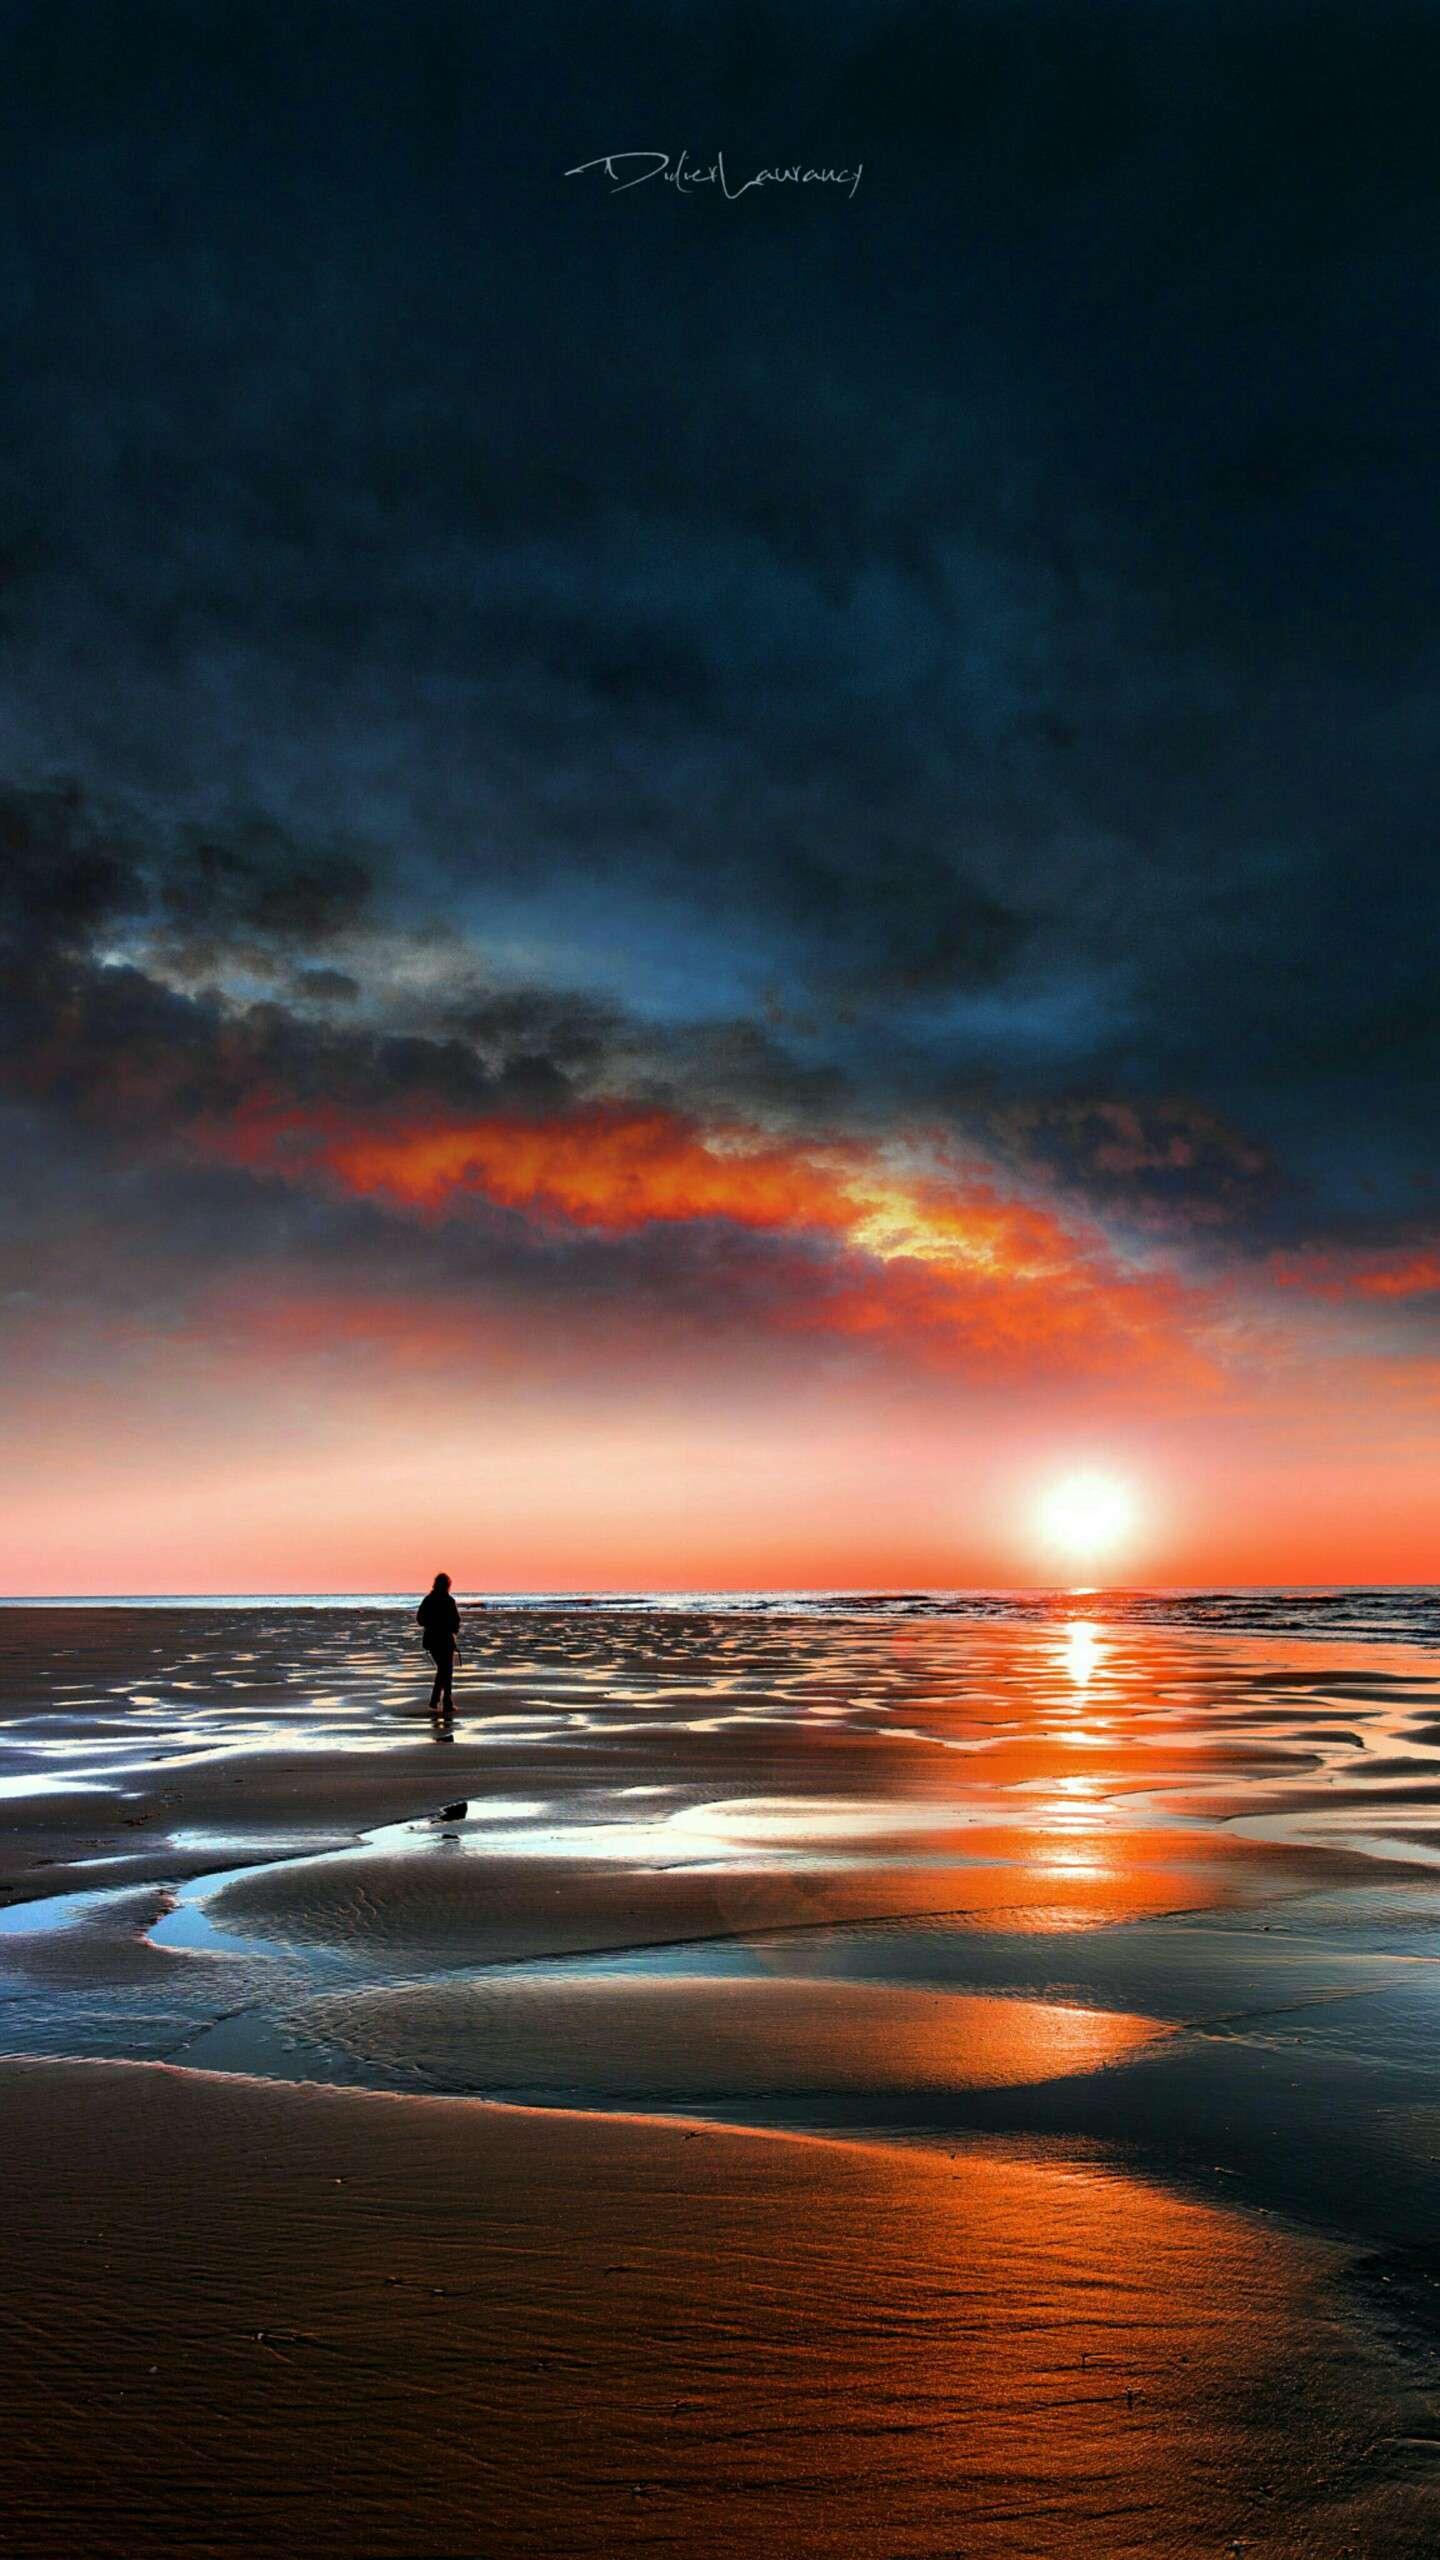 Ocean Horizon Sunset iPhone Wallpaper